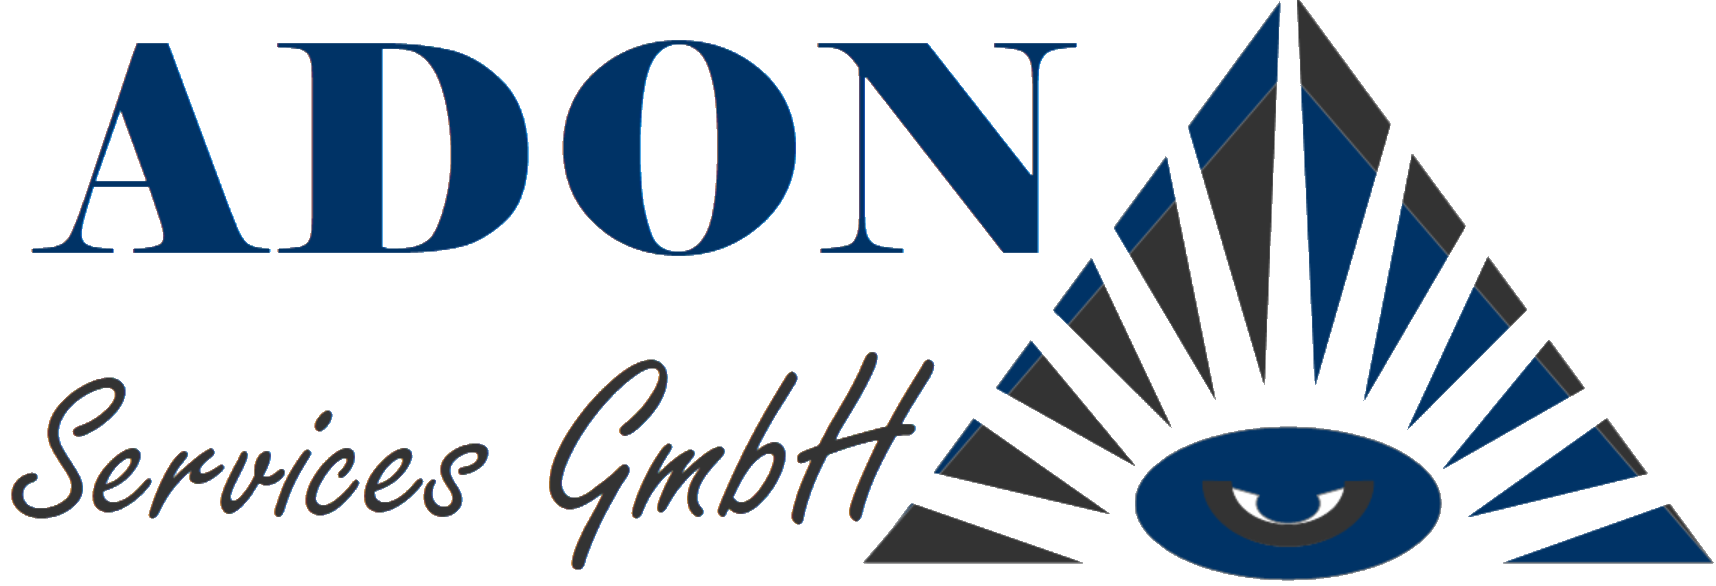 ADON Services GmbH